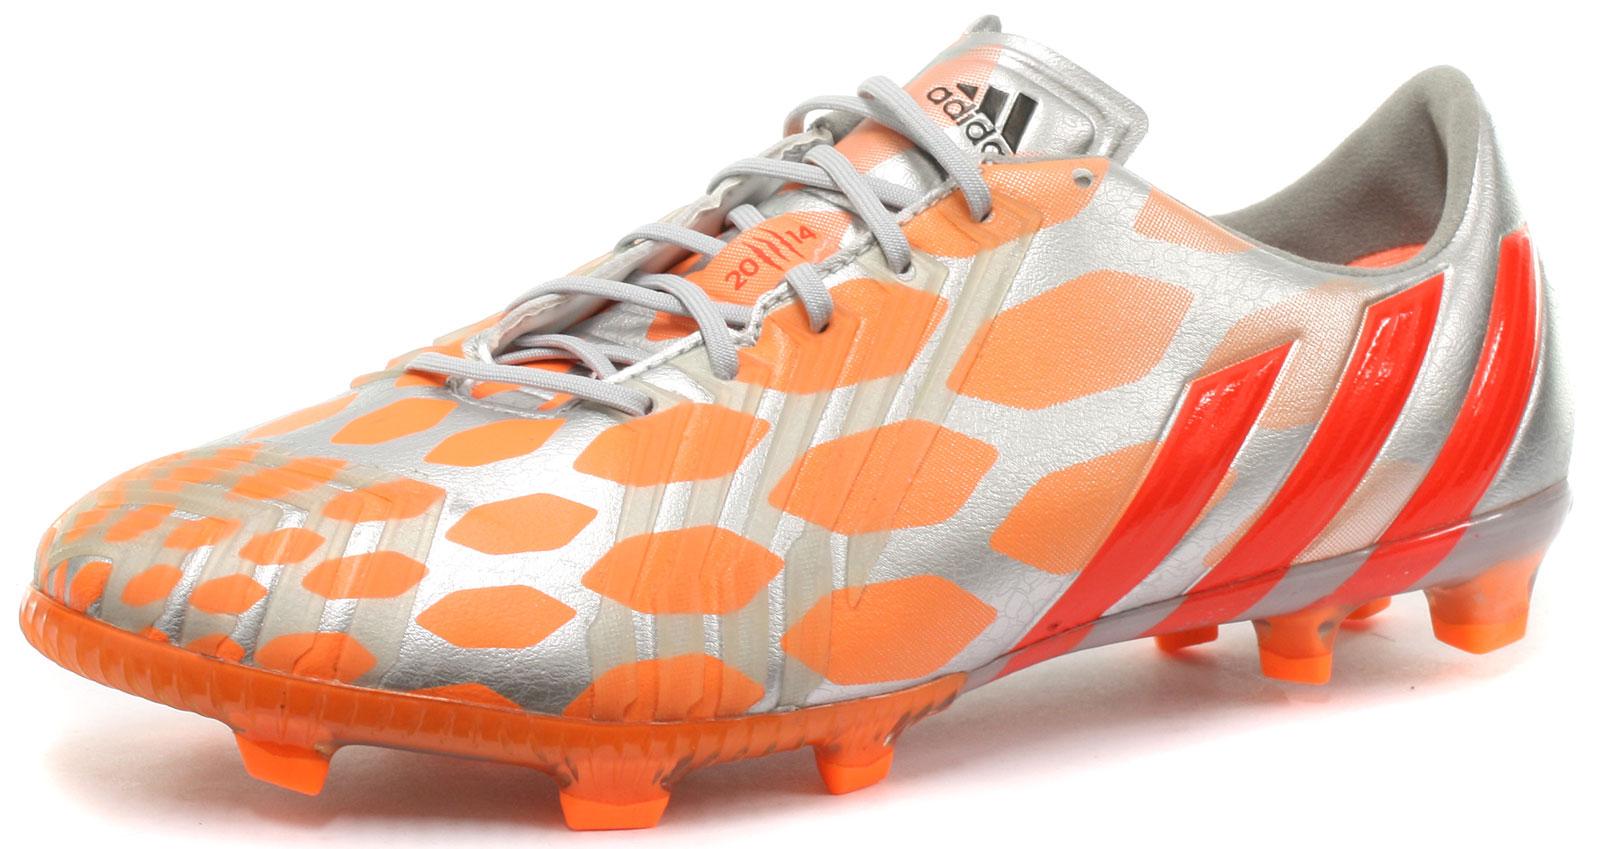 quality design 60039 e0af1 Image is loading adidas-Predator-Instinct-FG-W-Womens-Football-Boots-